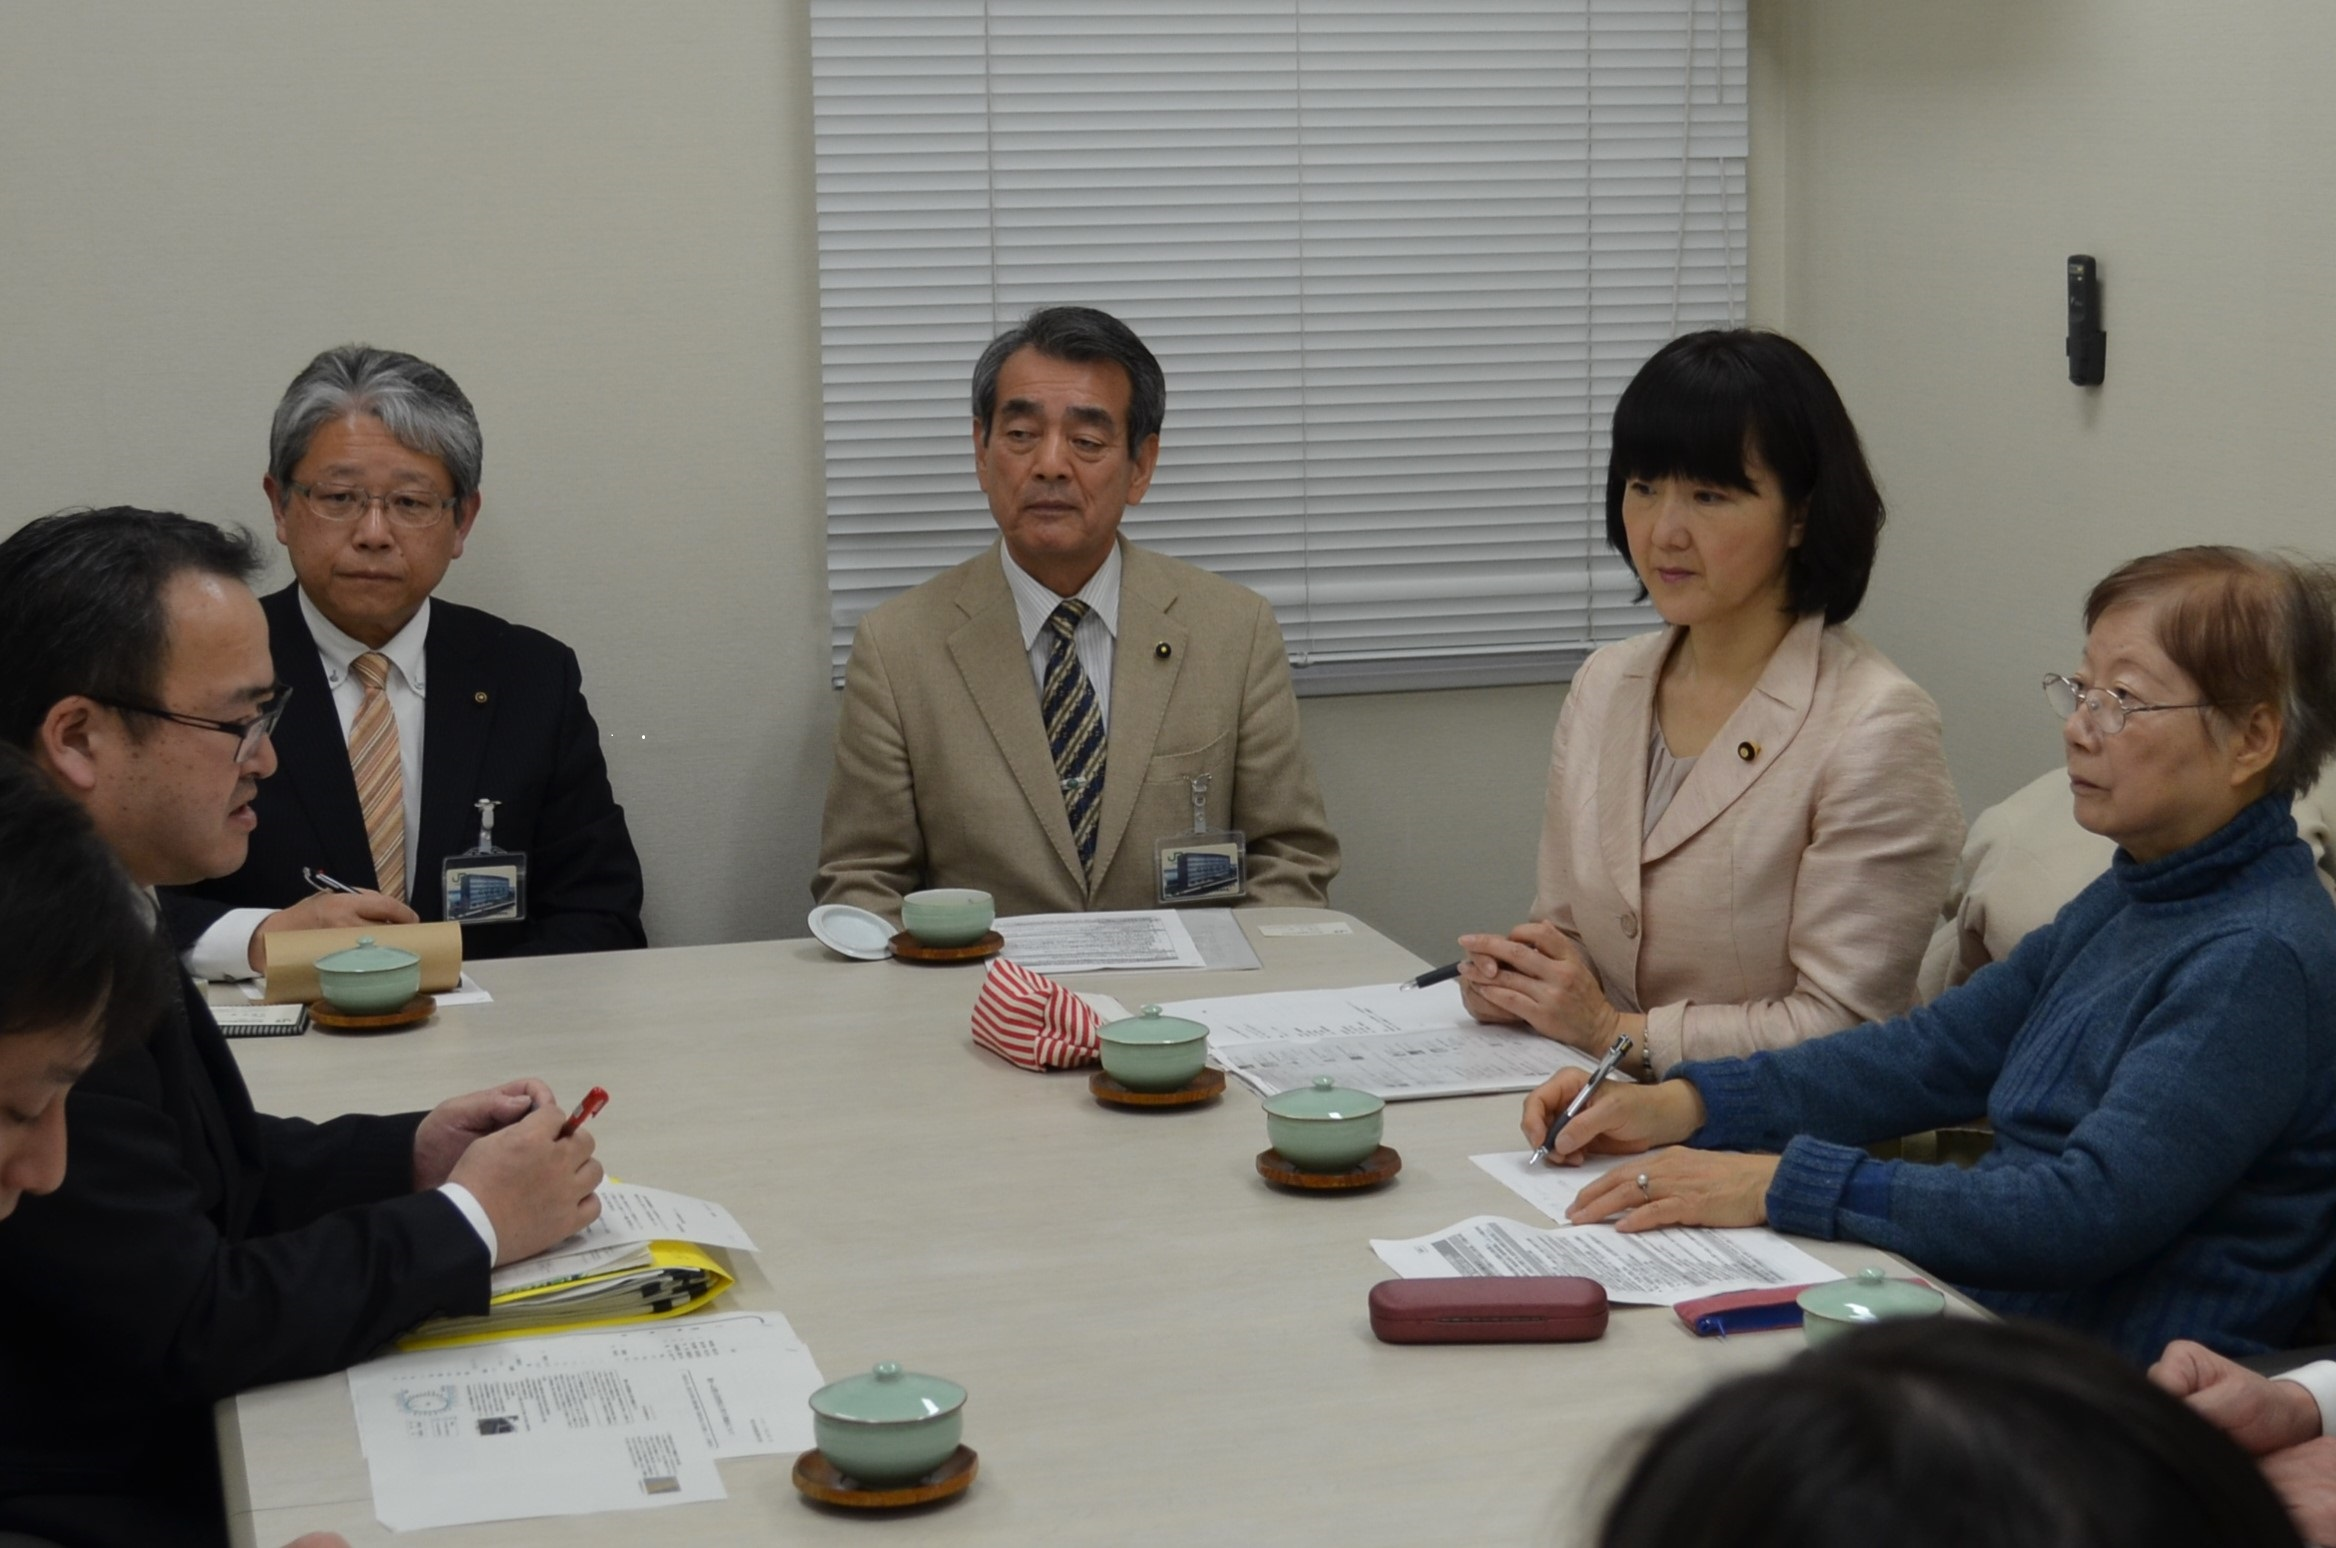 JRに申し入れを行う梅村衆議院議員(右から2人目)と鈴木市議(右から4人目)